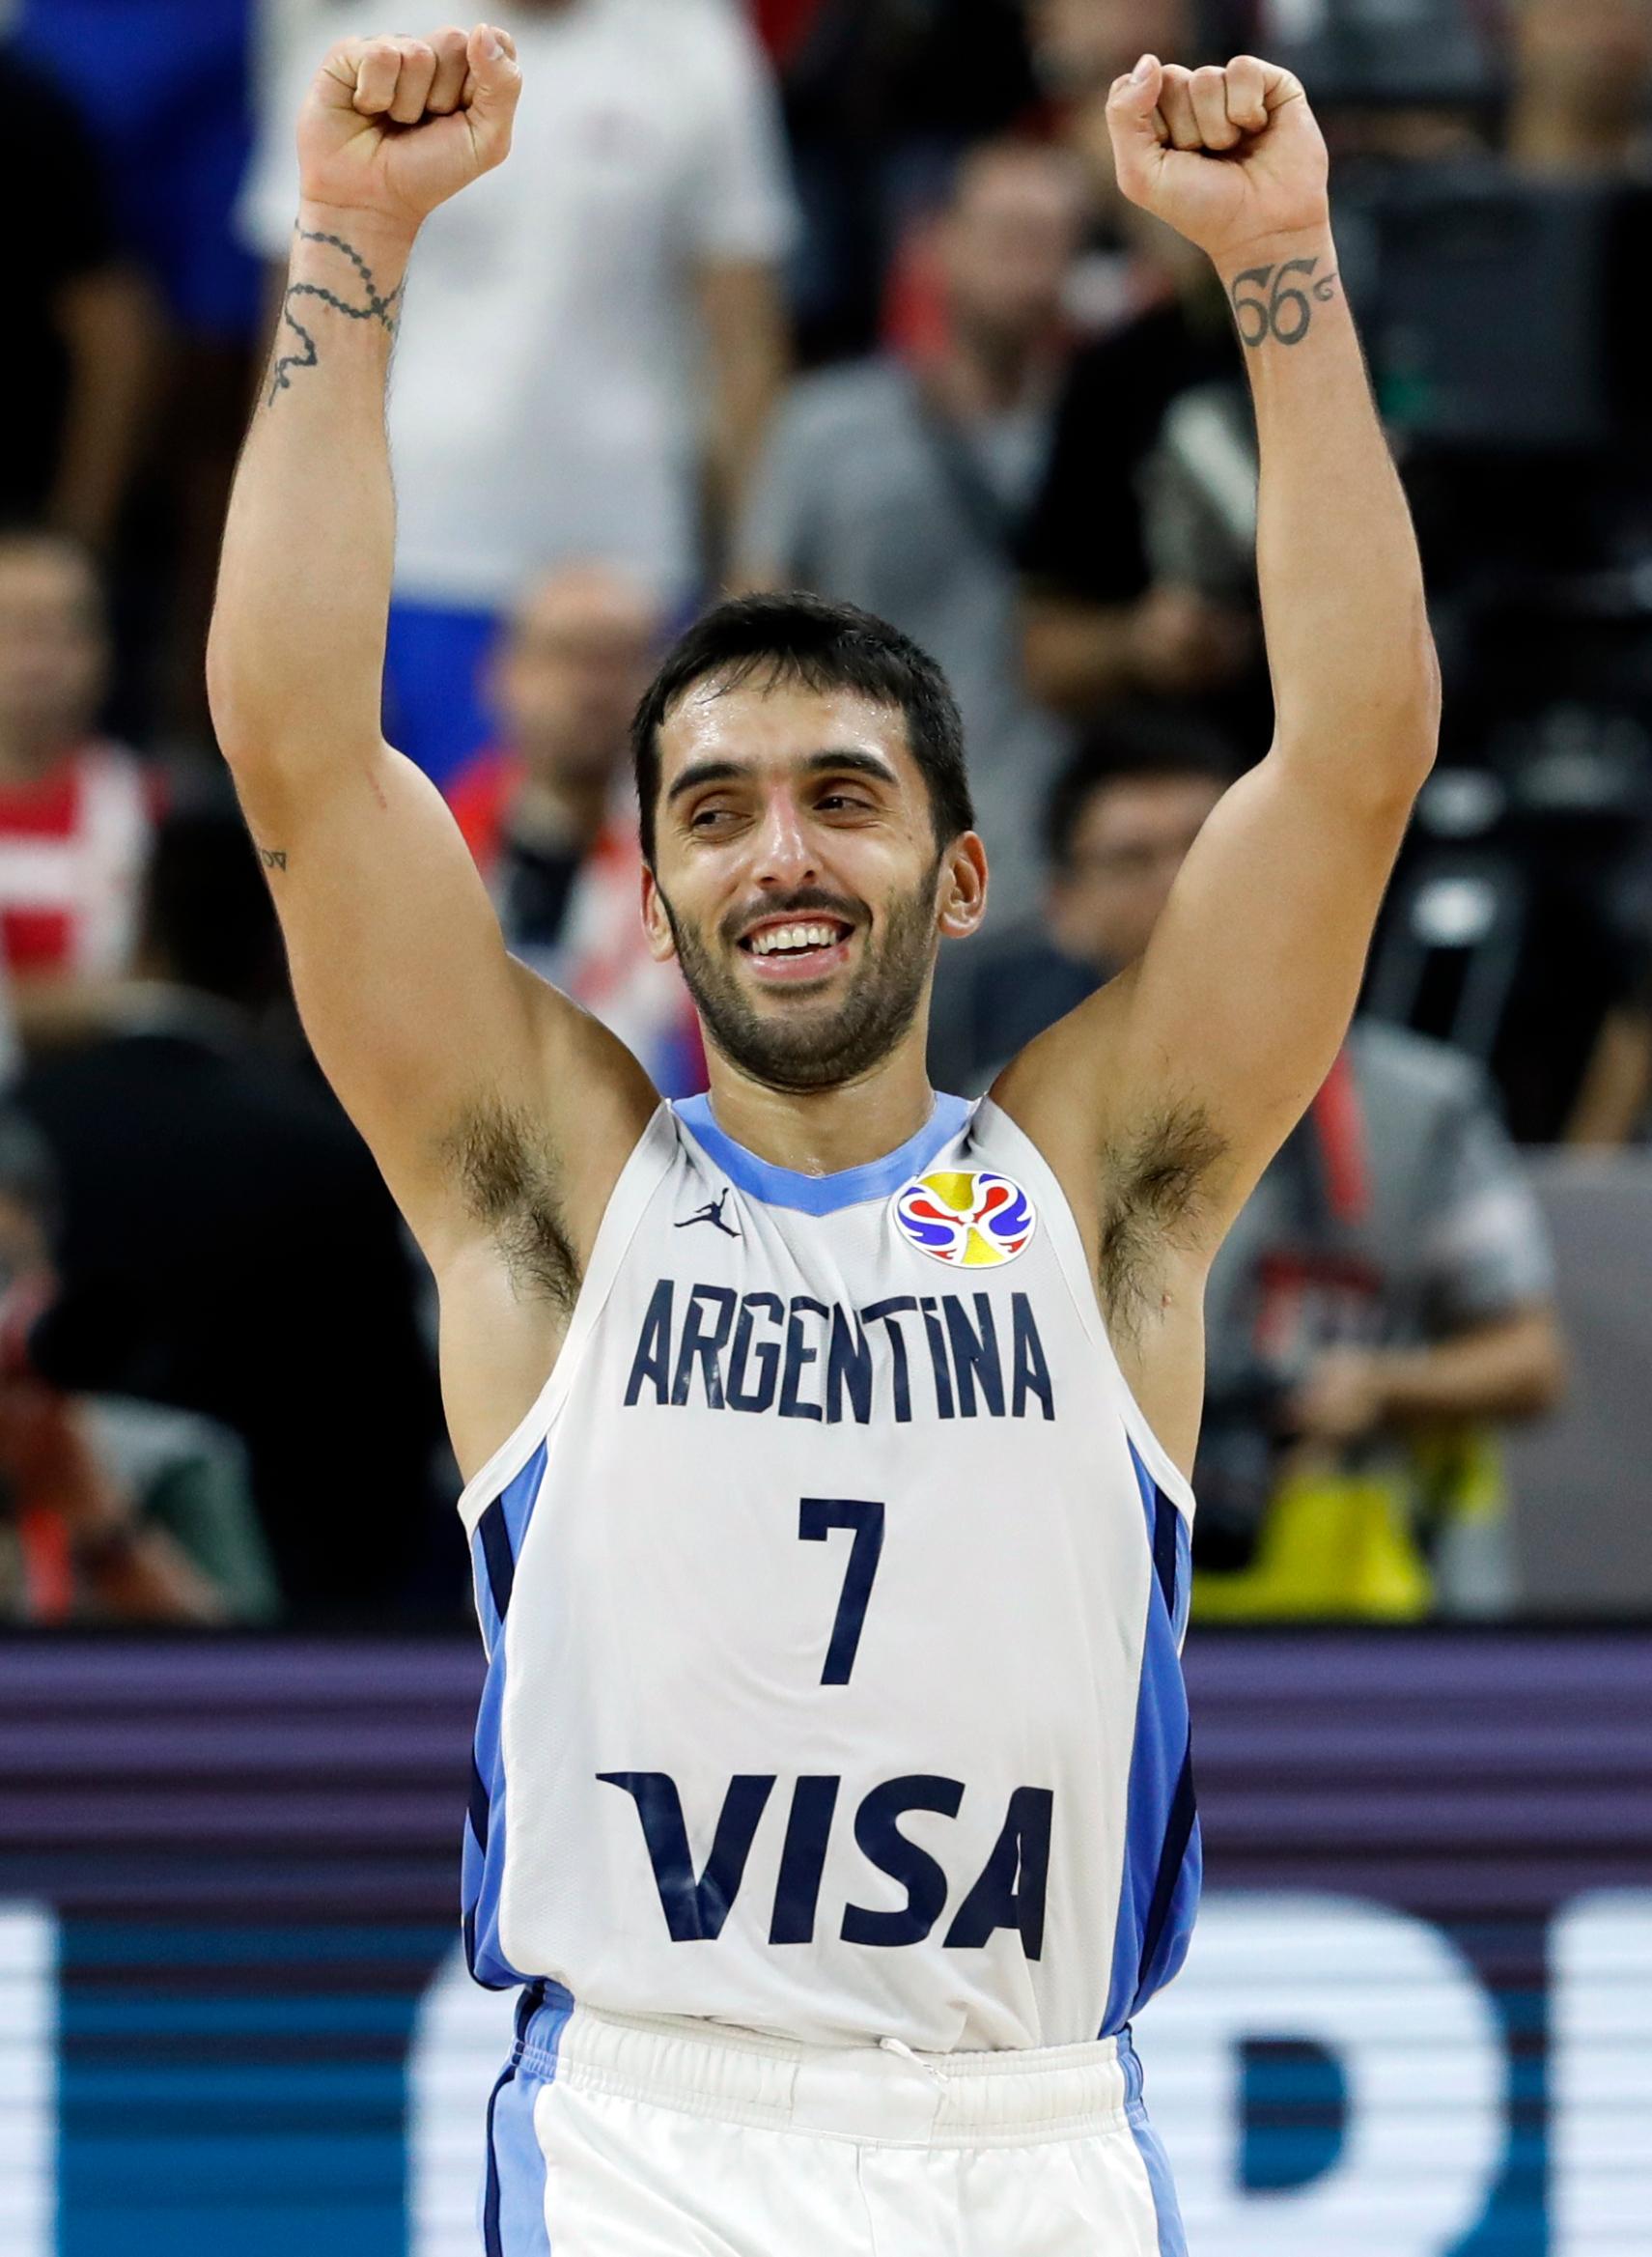 Basketball - FIBA World Cup - Quarter Finals - Argentina v Serbia - Dongguan Basketball Center, Dongguan, China - September 10, 2019  Argentina's Facundo Campazzo celebrates victory after the match REUTERS/Kim Kyung-Hoon